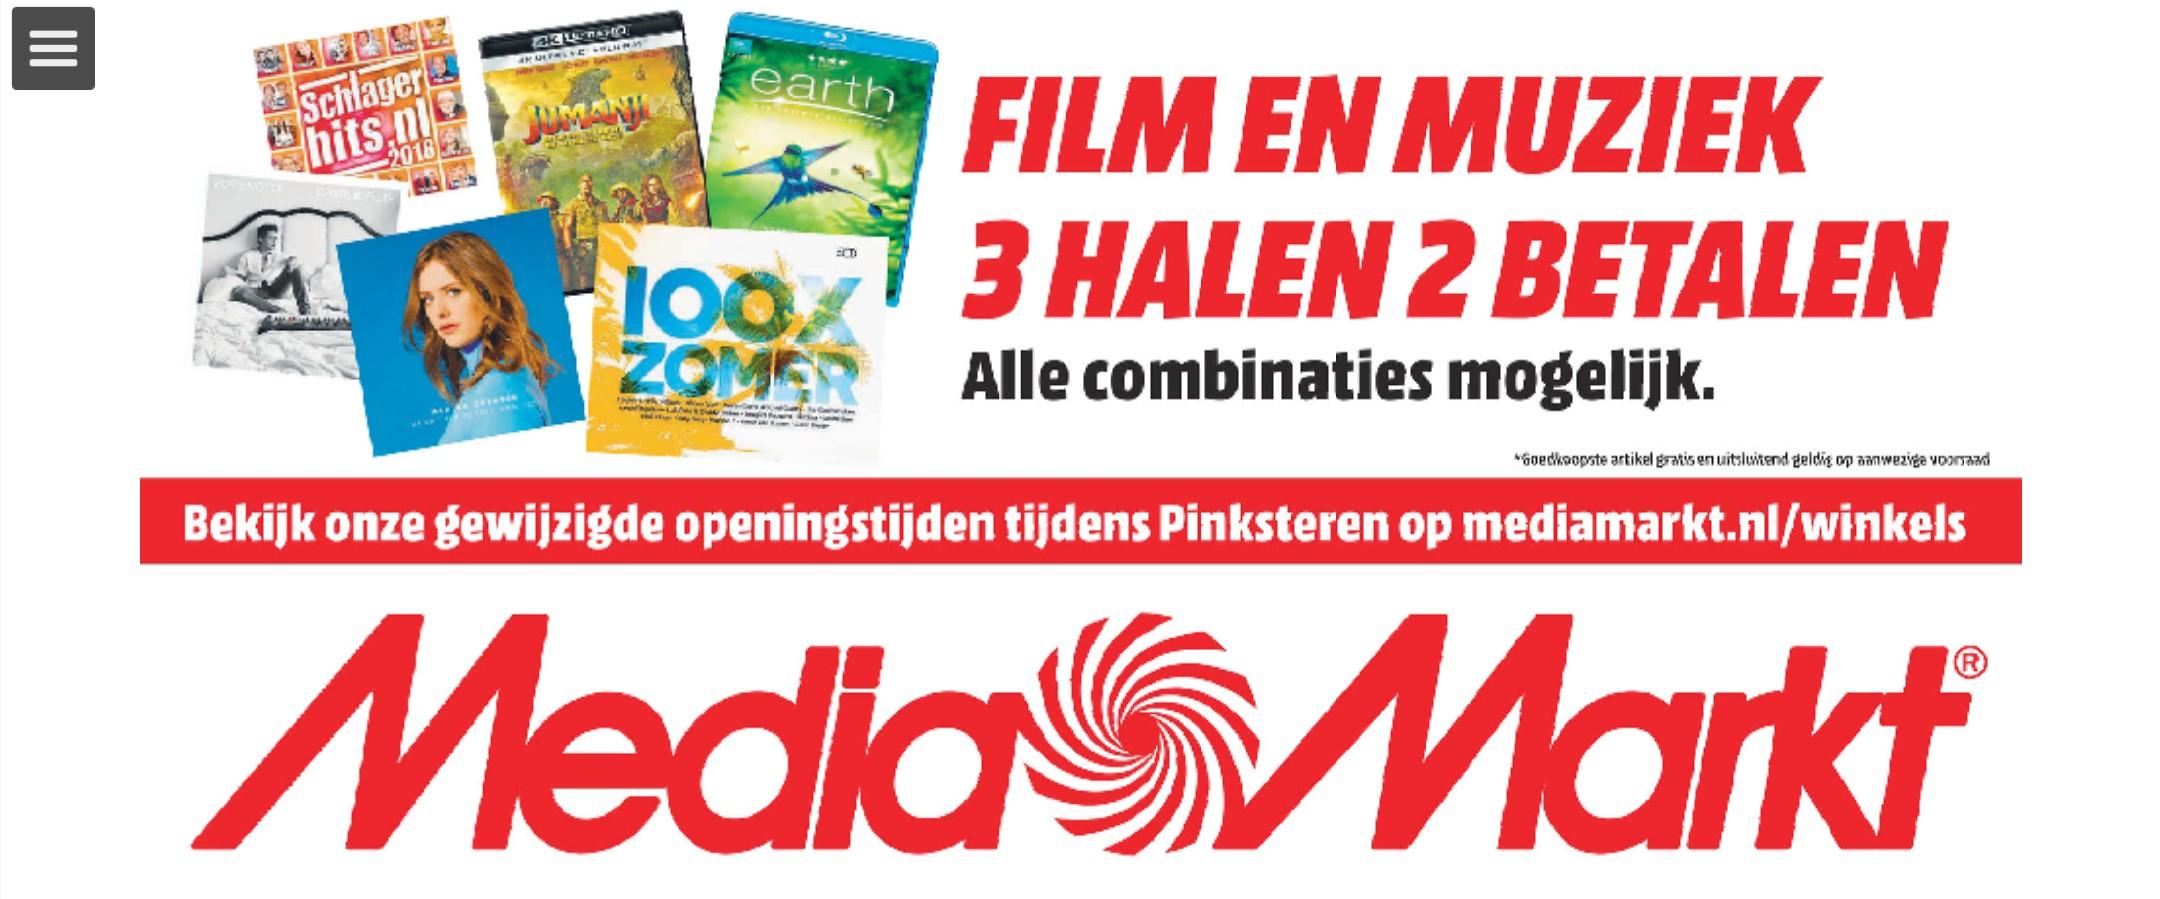 V.a. 21 mei: Film en Muziek 3 halen 2 betalen @ Mediamarkt